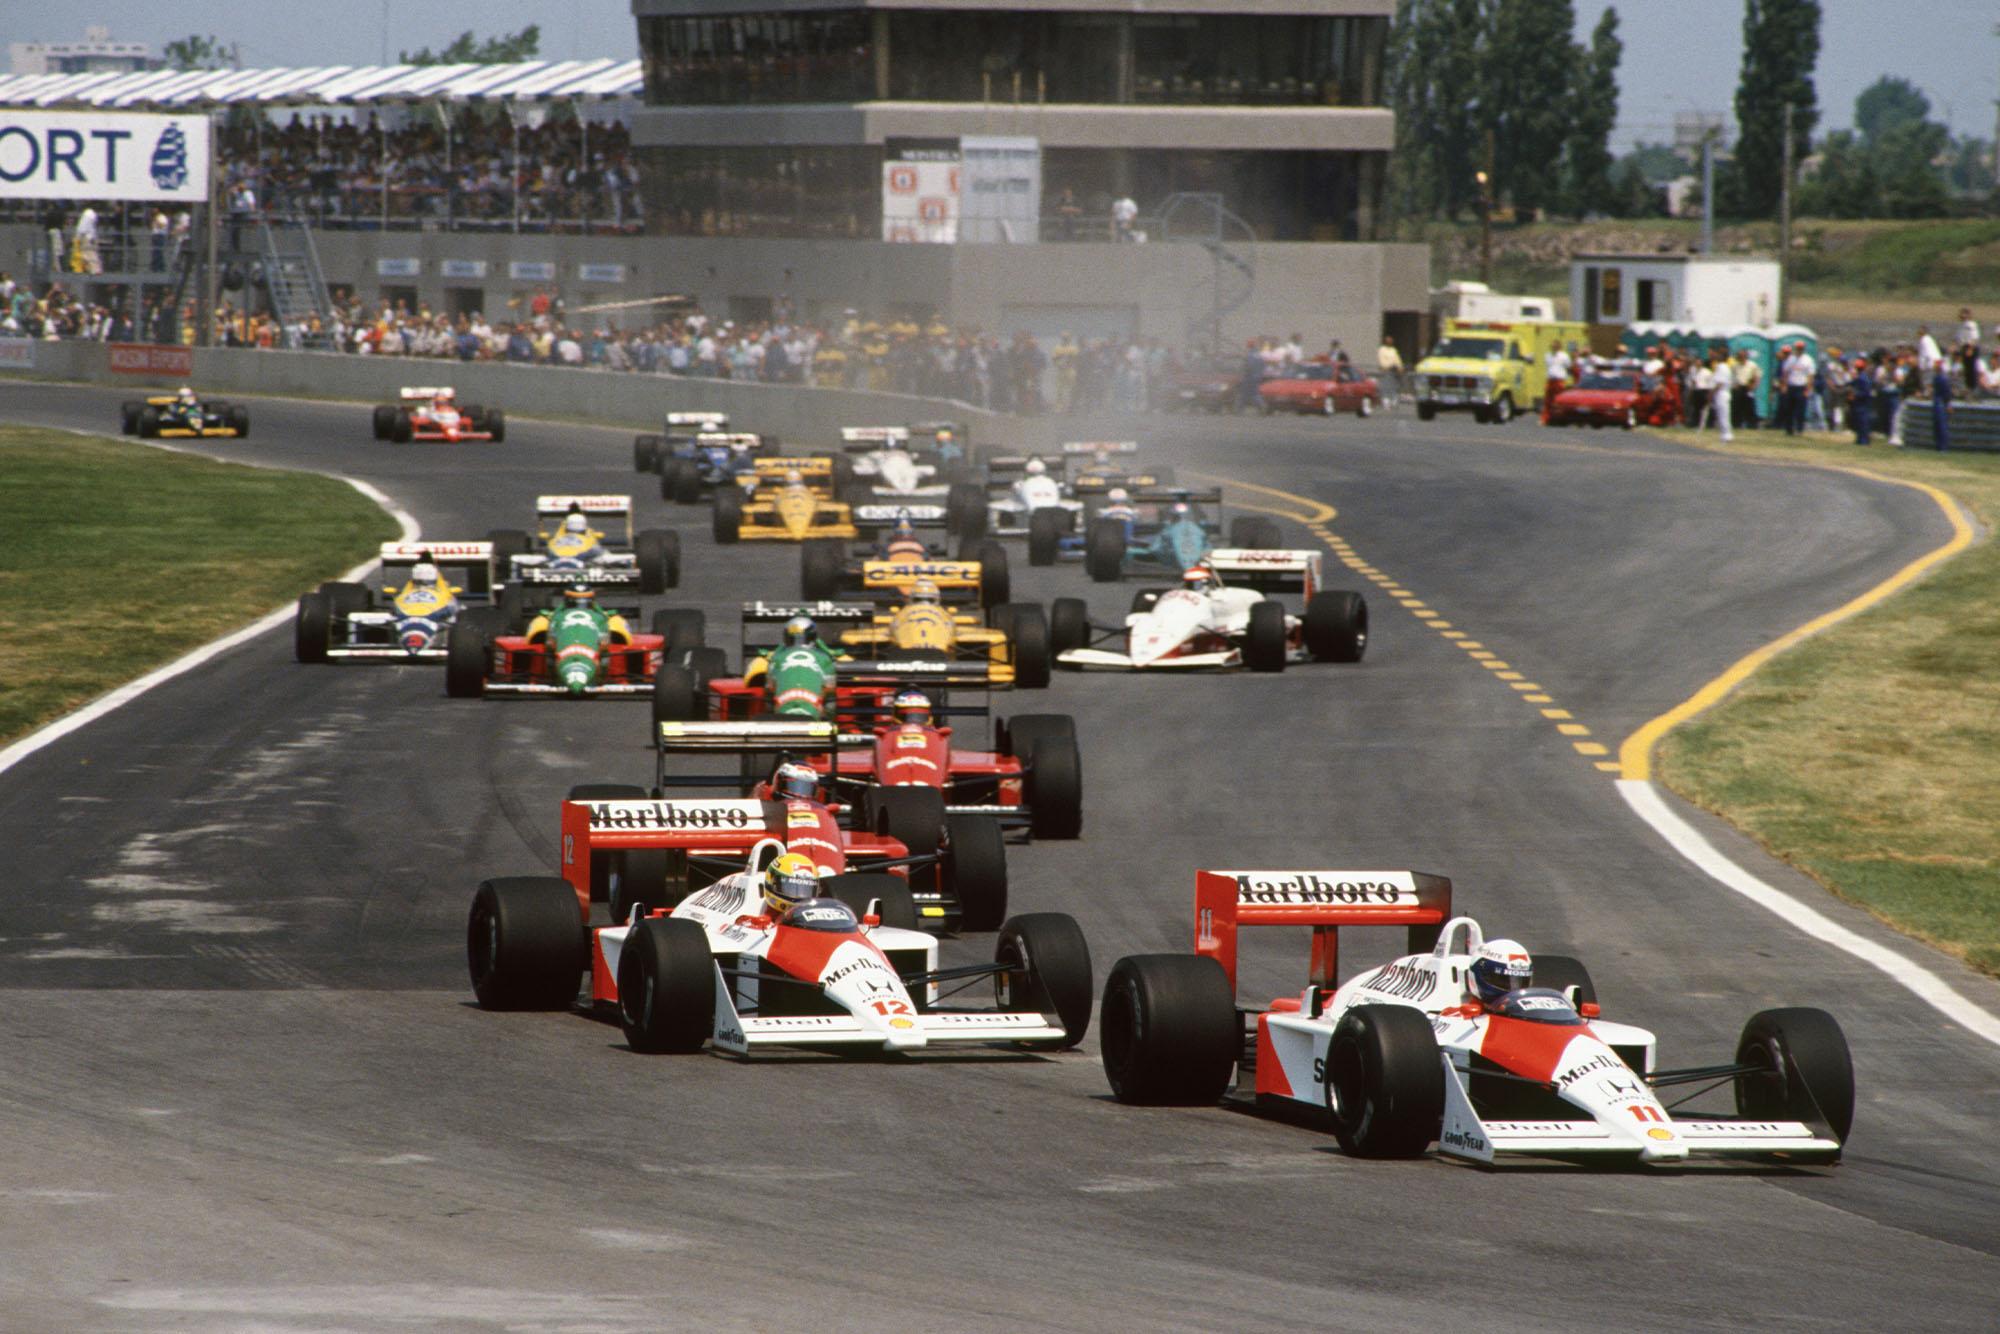 1988 CAN GP start